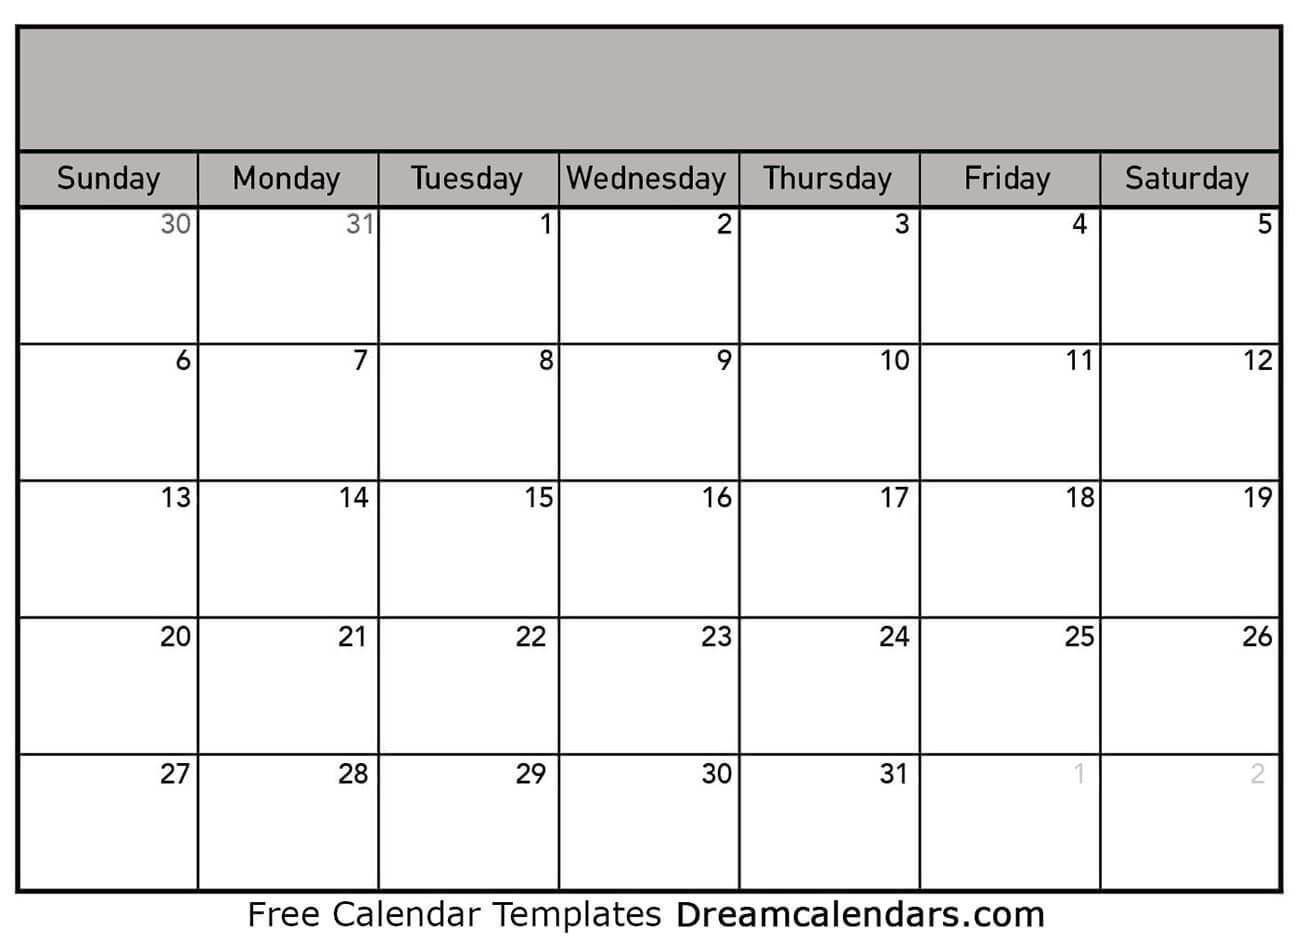 Printable Blank Calendar 2020 | Dream Calendars-Blank Calendar 4 Months